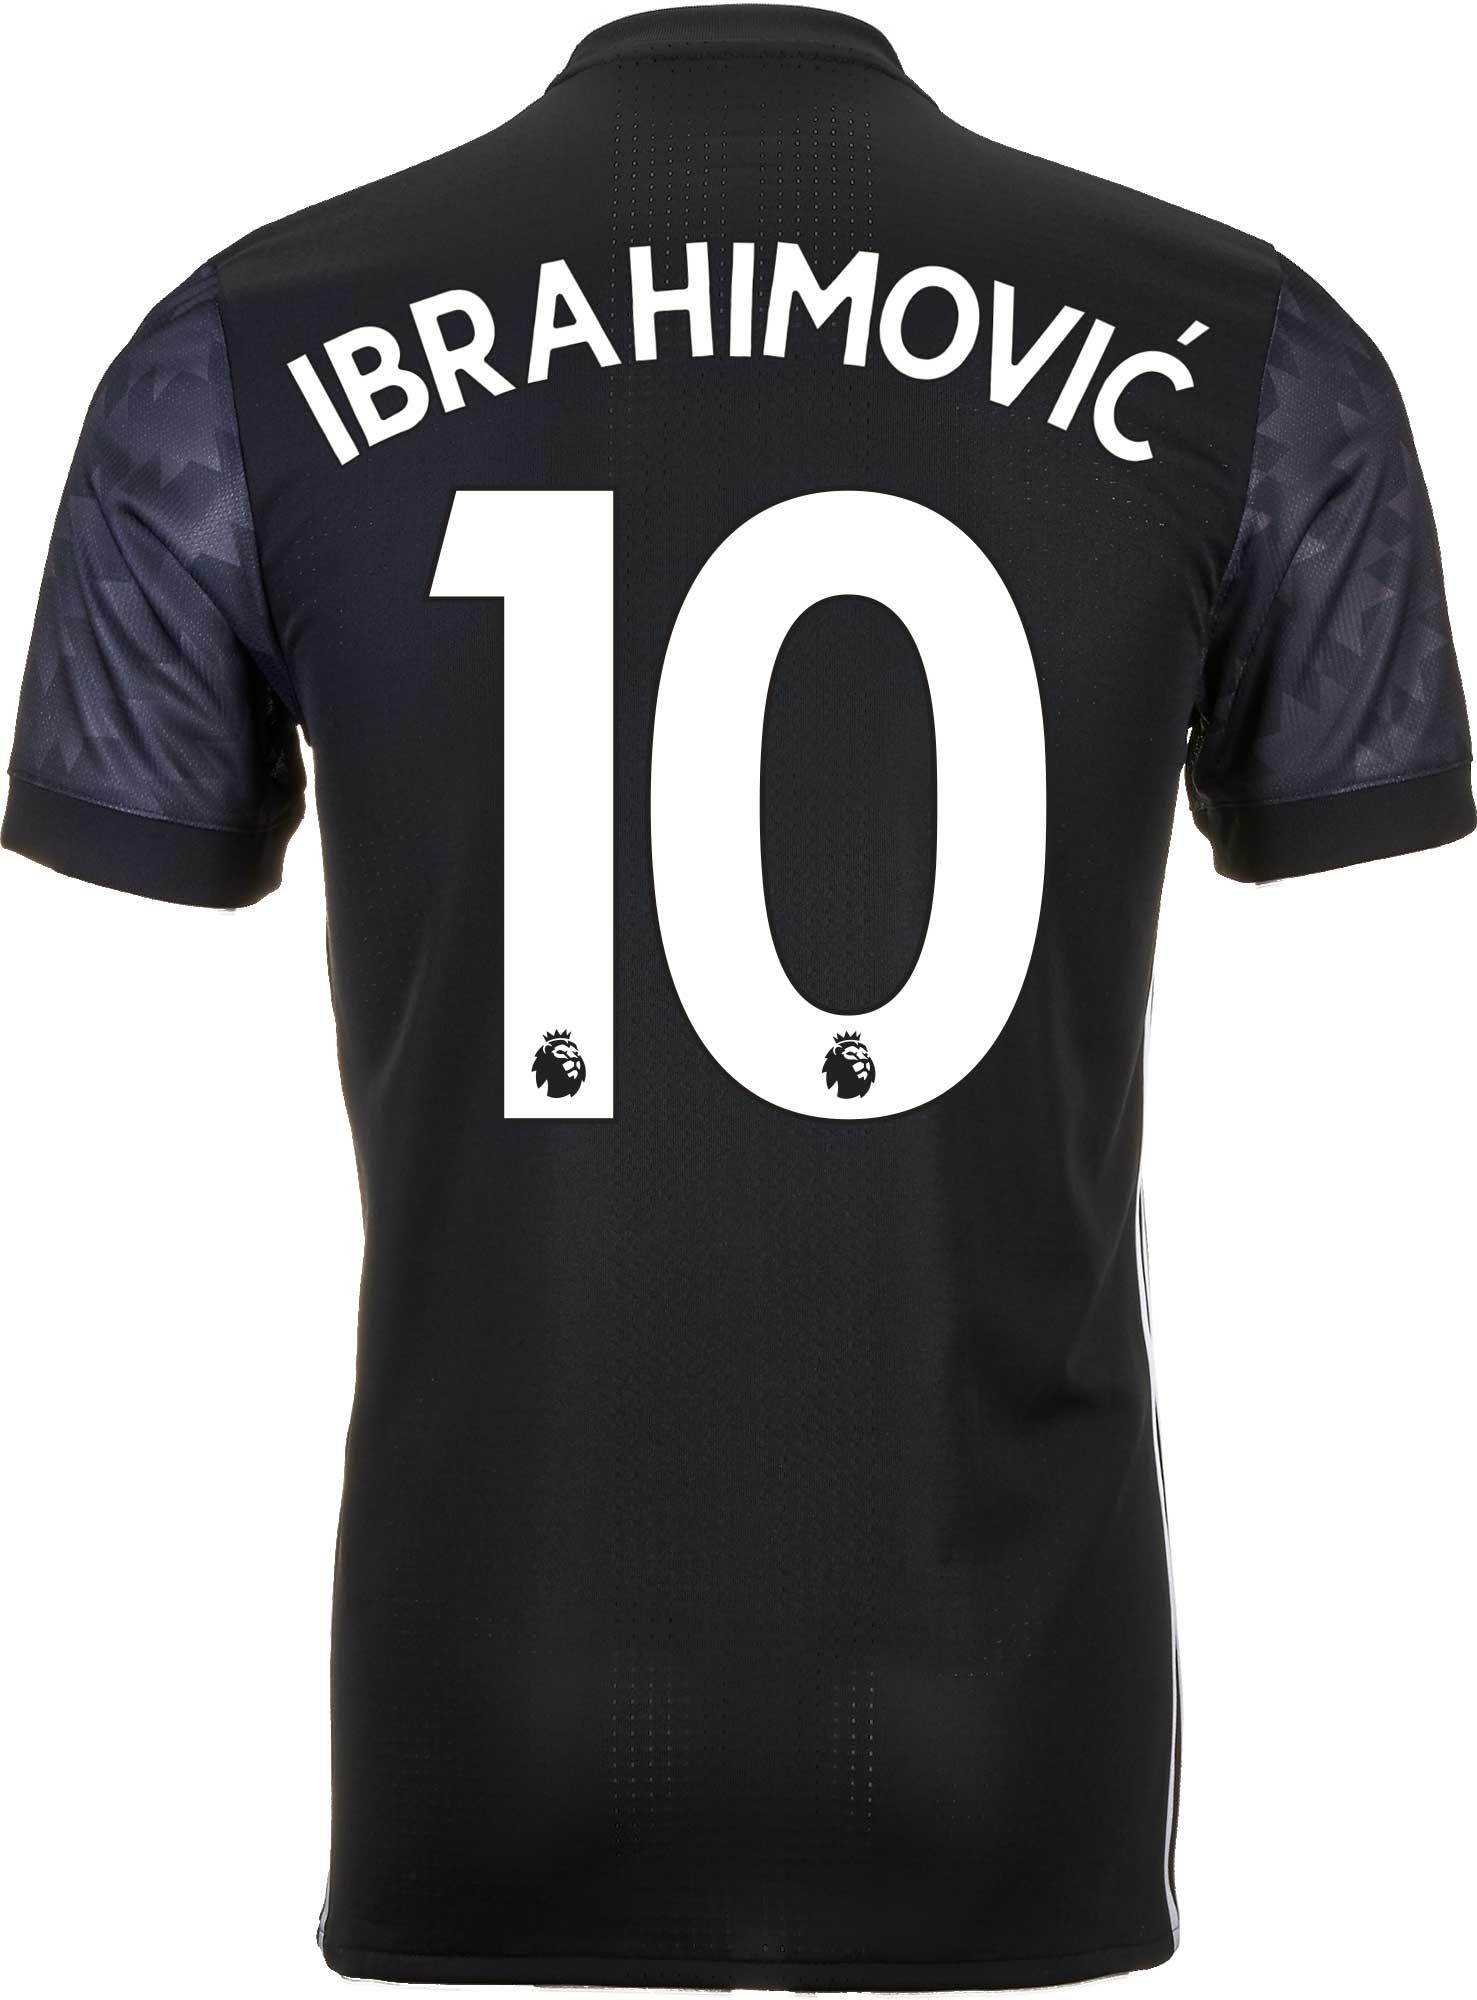 2017/18 adidas Zlatan Ibrahimovic Manchester United ...